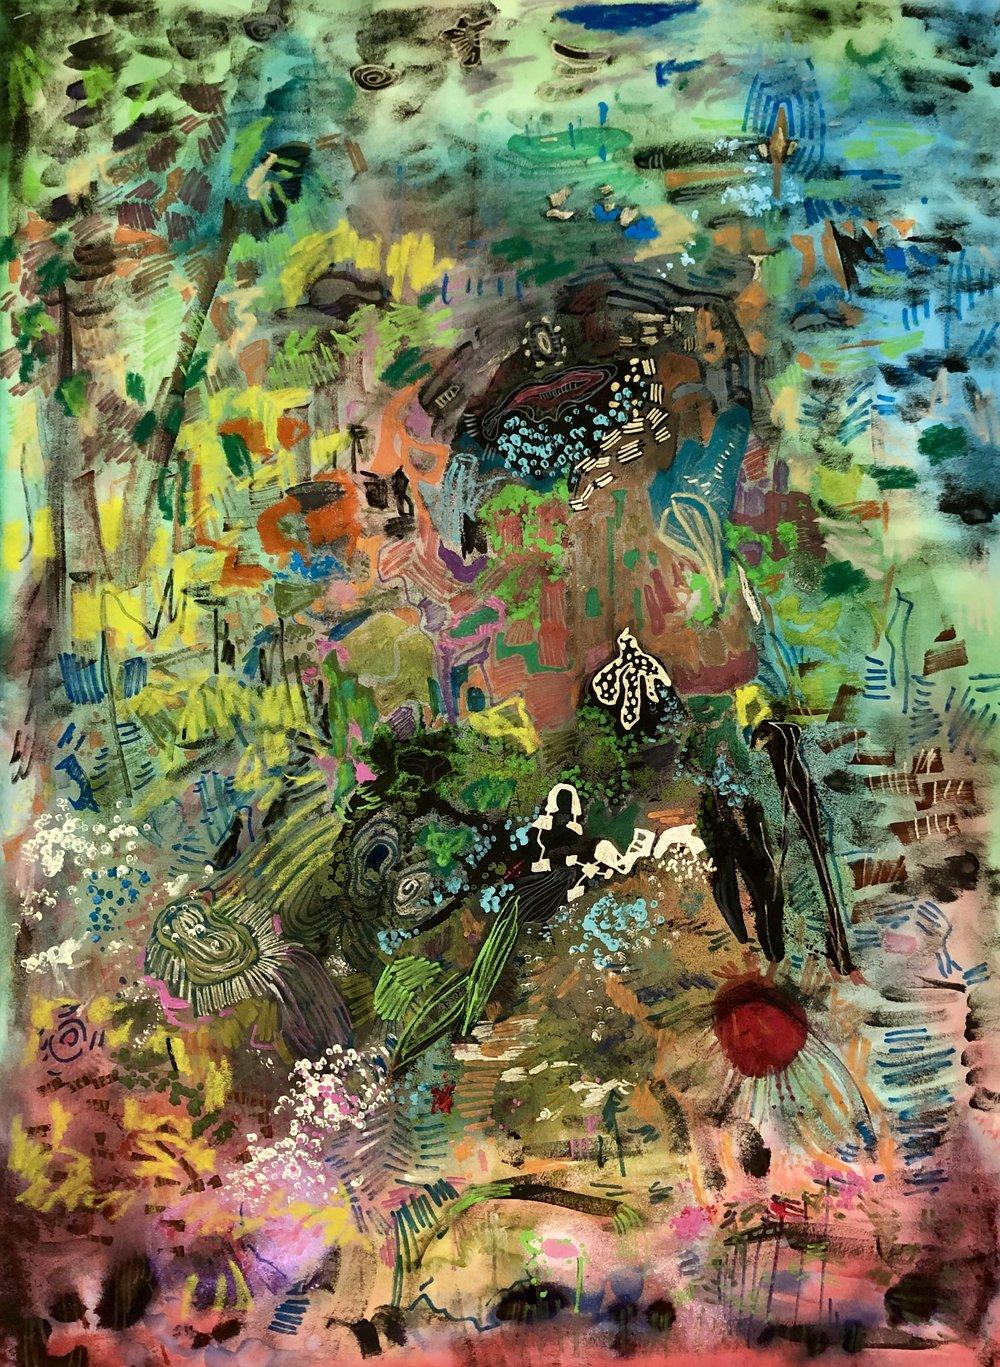 "For a breath I tarry; Oil Pastel and Acrylic on Evolon; 20""x30""; 2019"